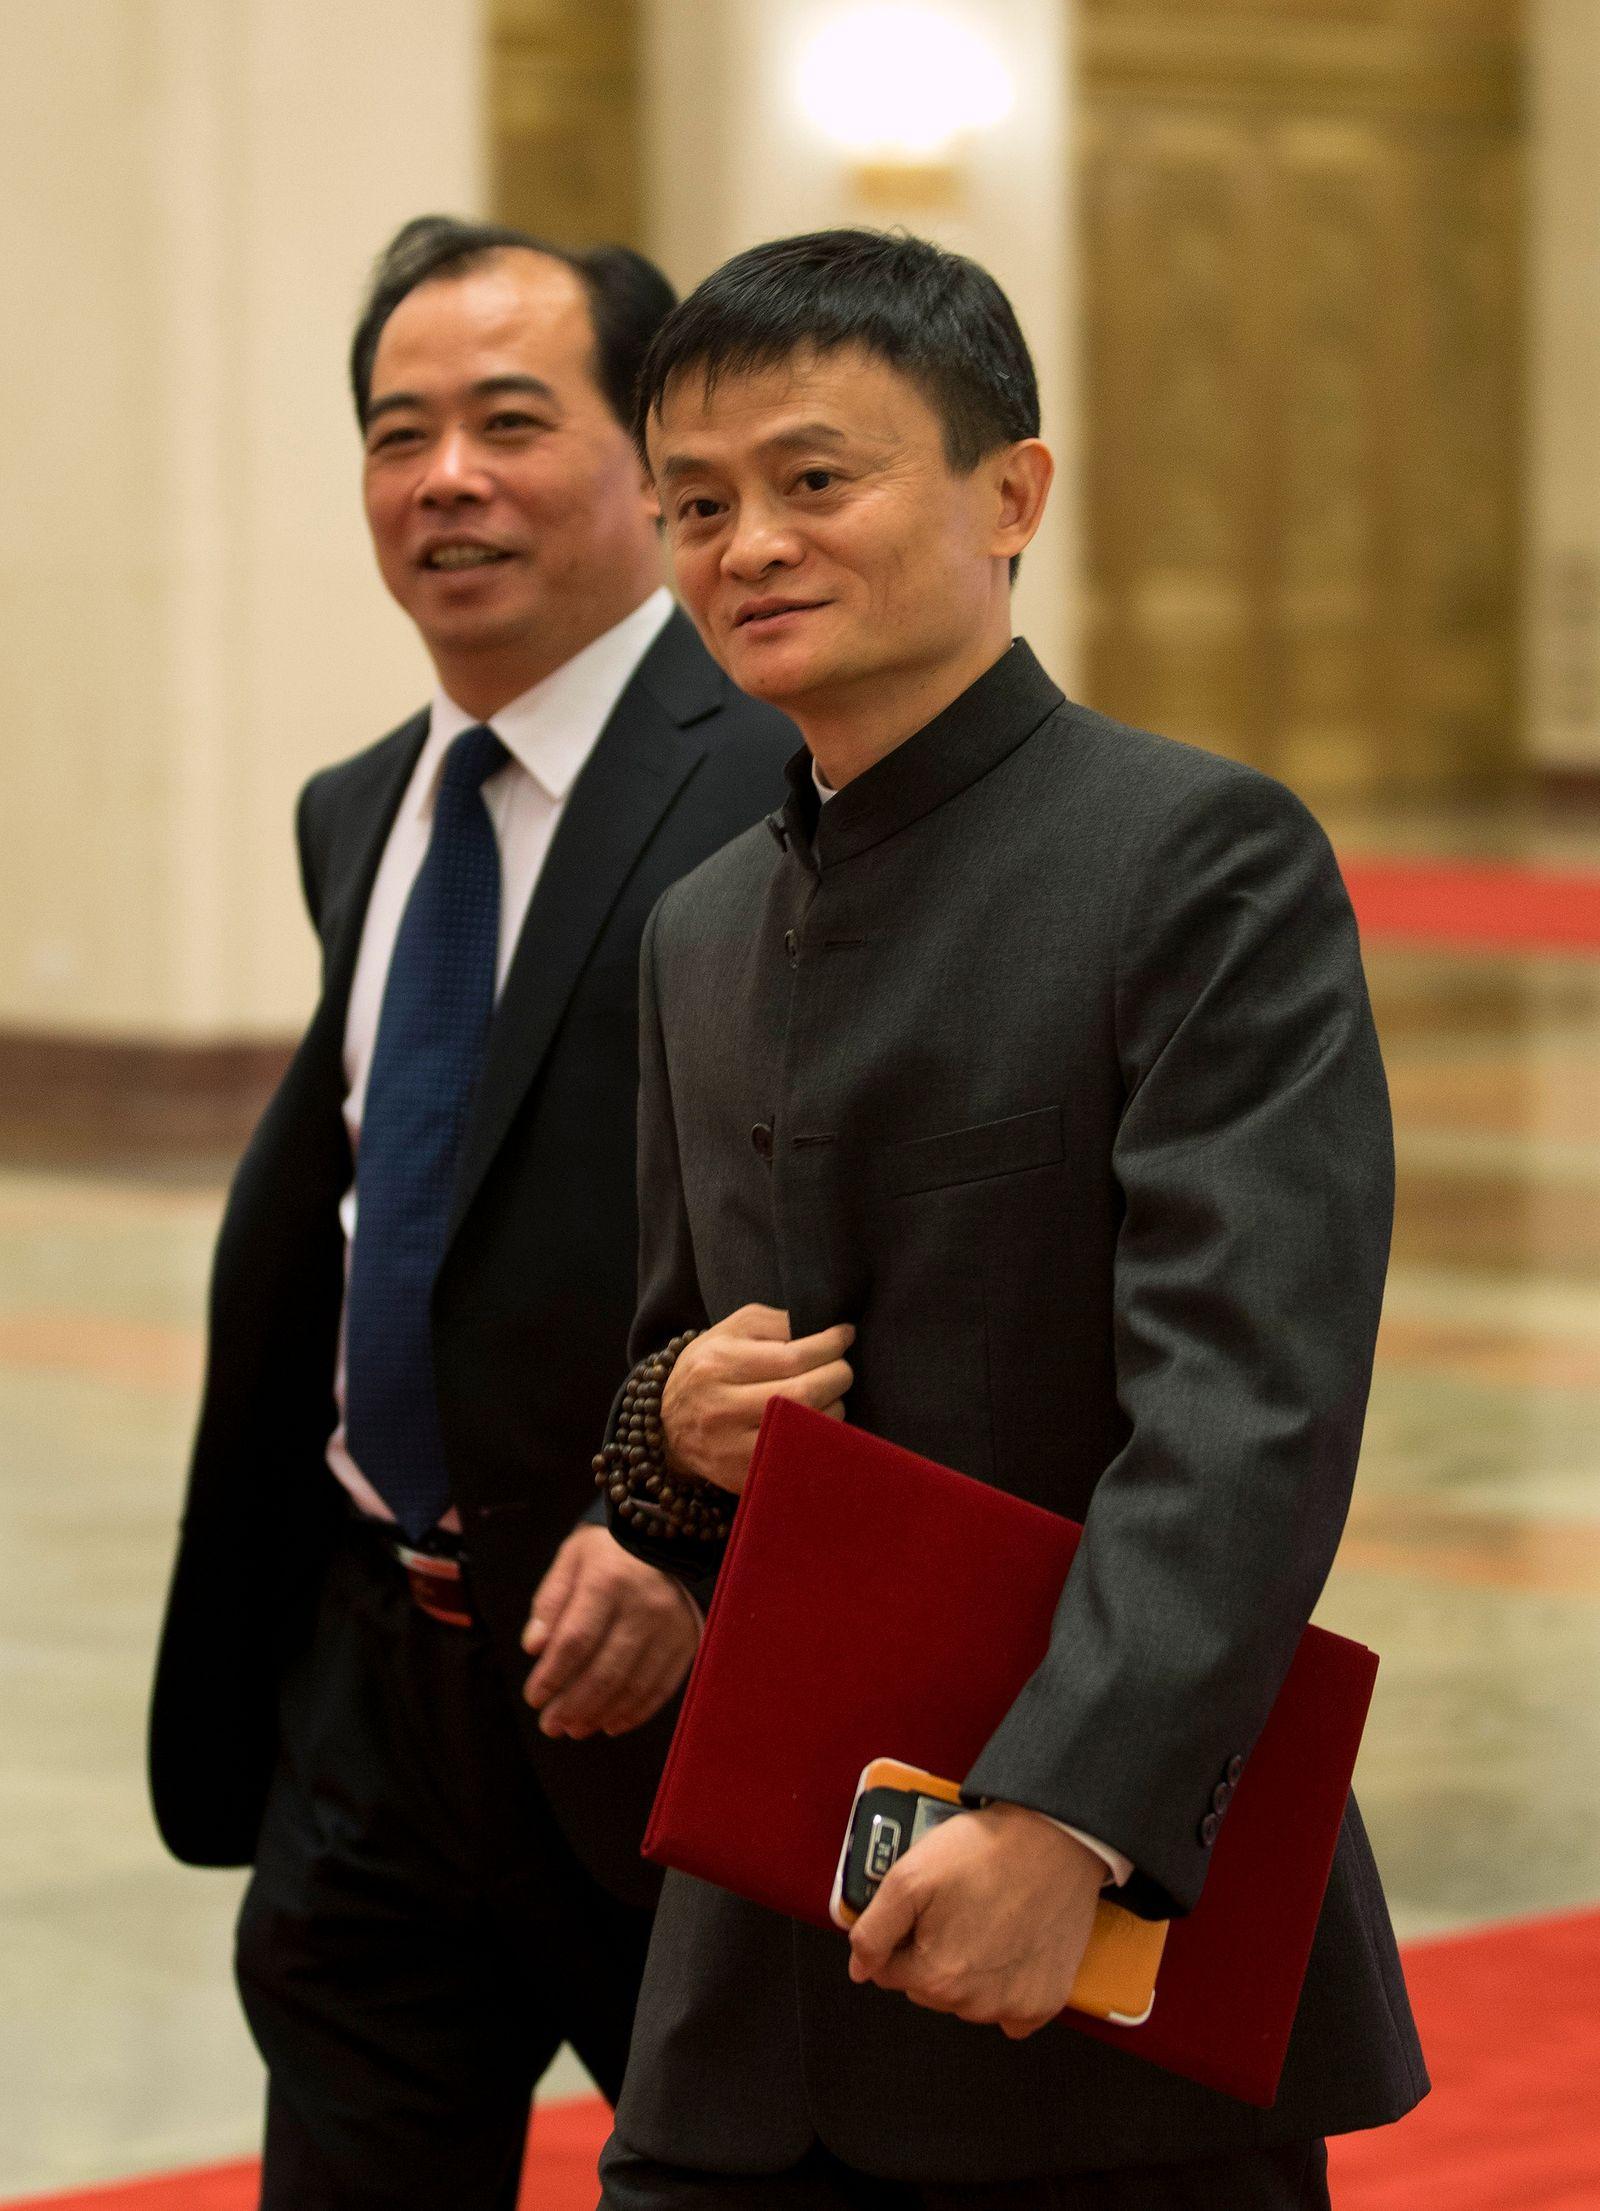 Alibaba / Jack Ma